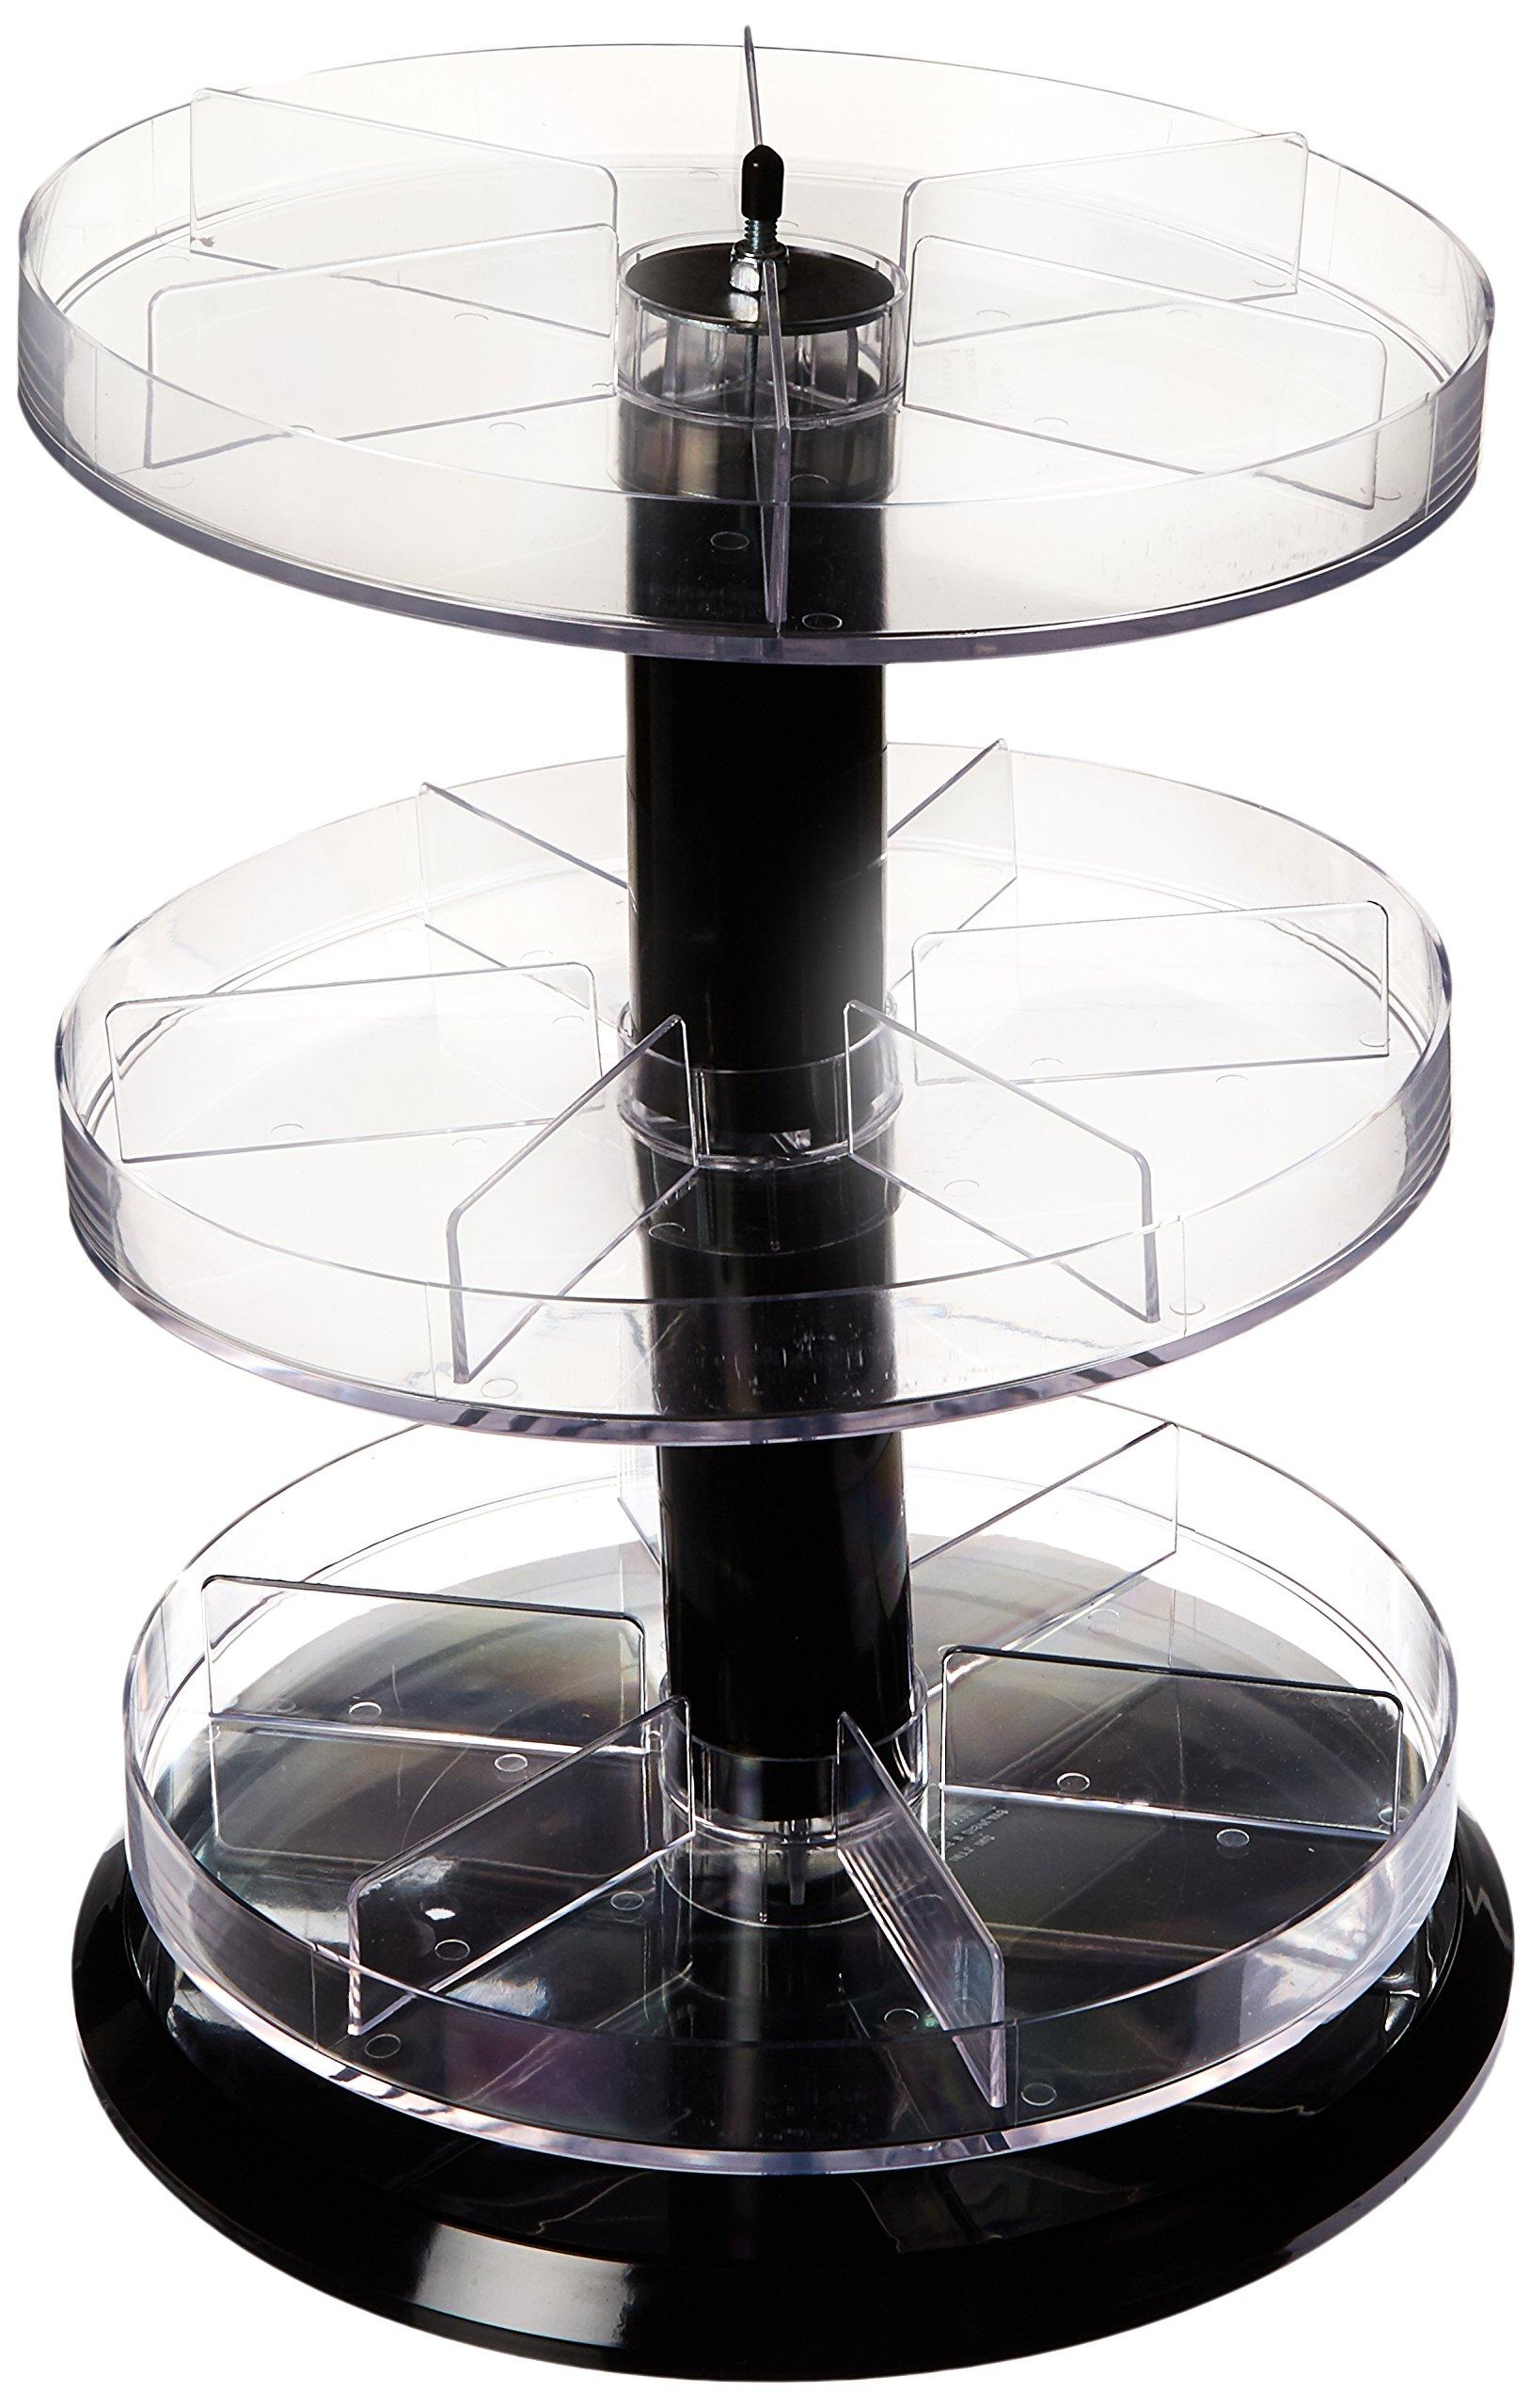 Azar Displays 226030 11'' Dia x 13.5'' H 3-Tier Round Divider Counter Display